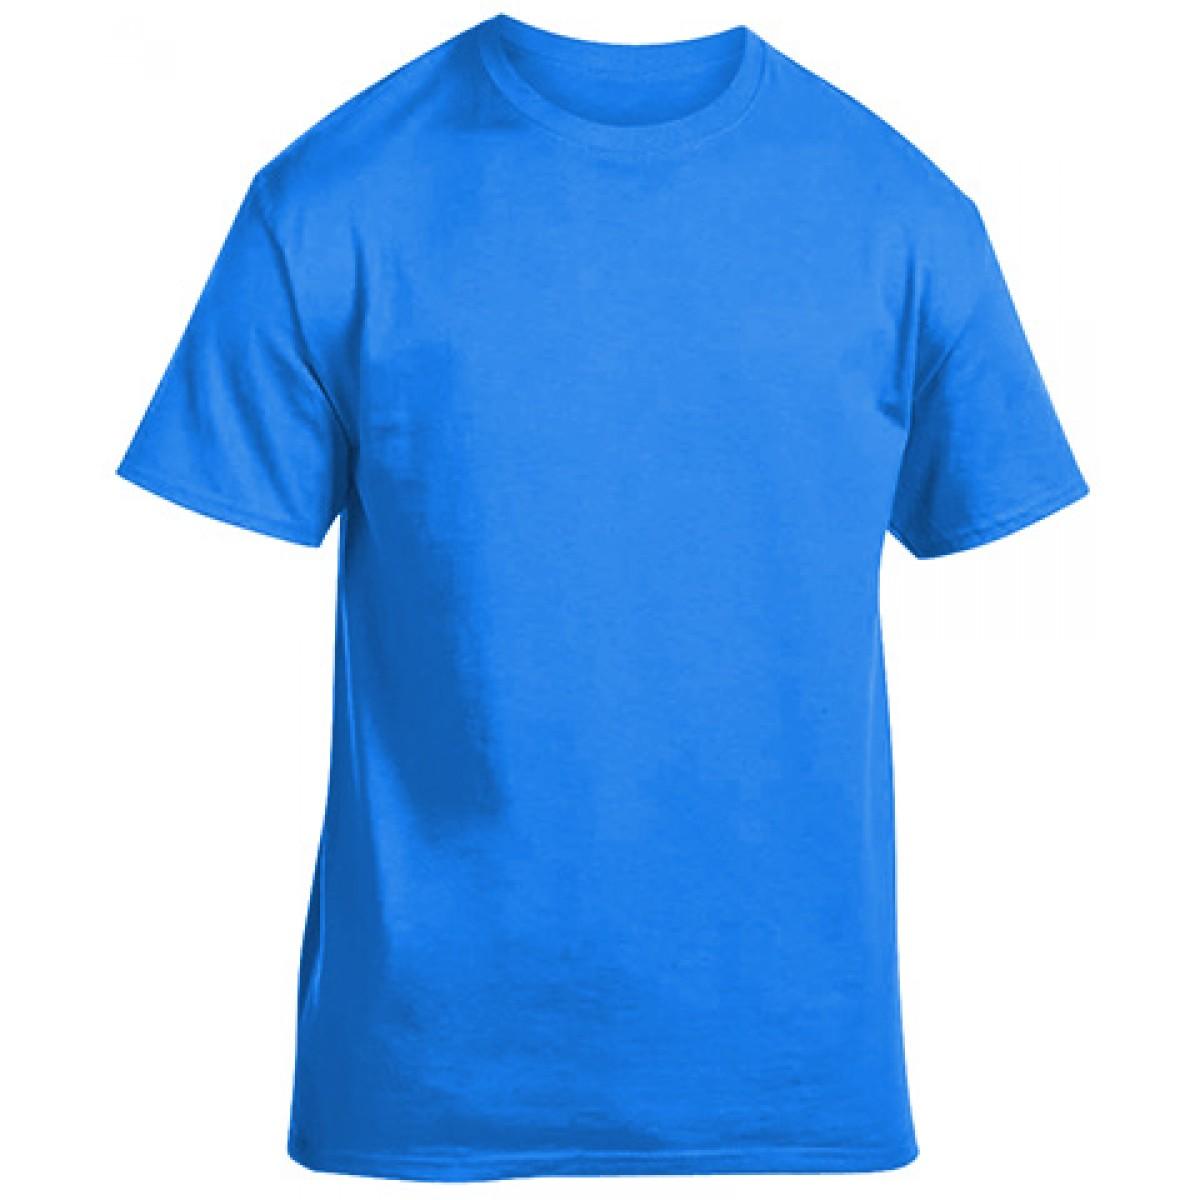 Soft 100% Cotton T-Shirt-Neon Blue-XL